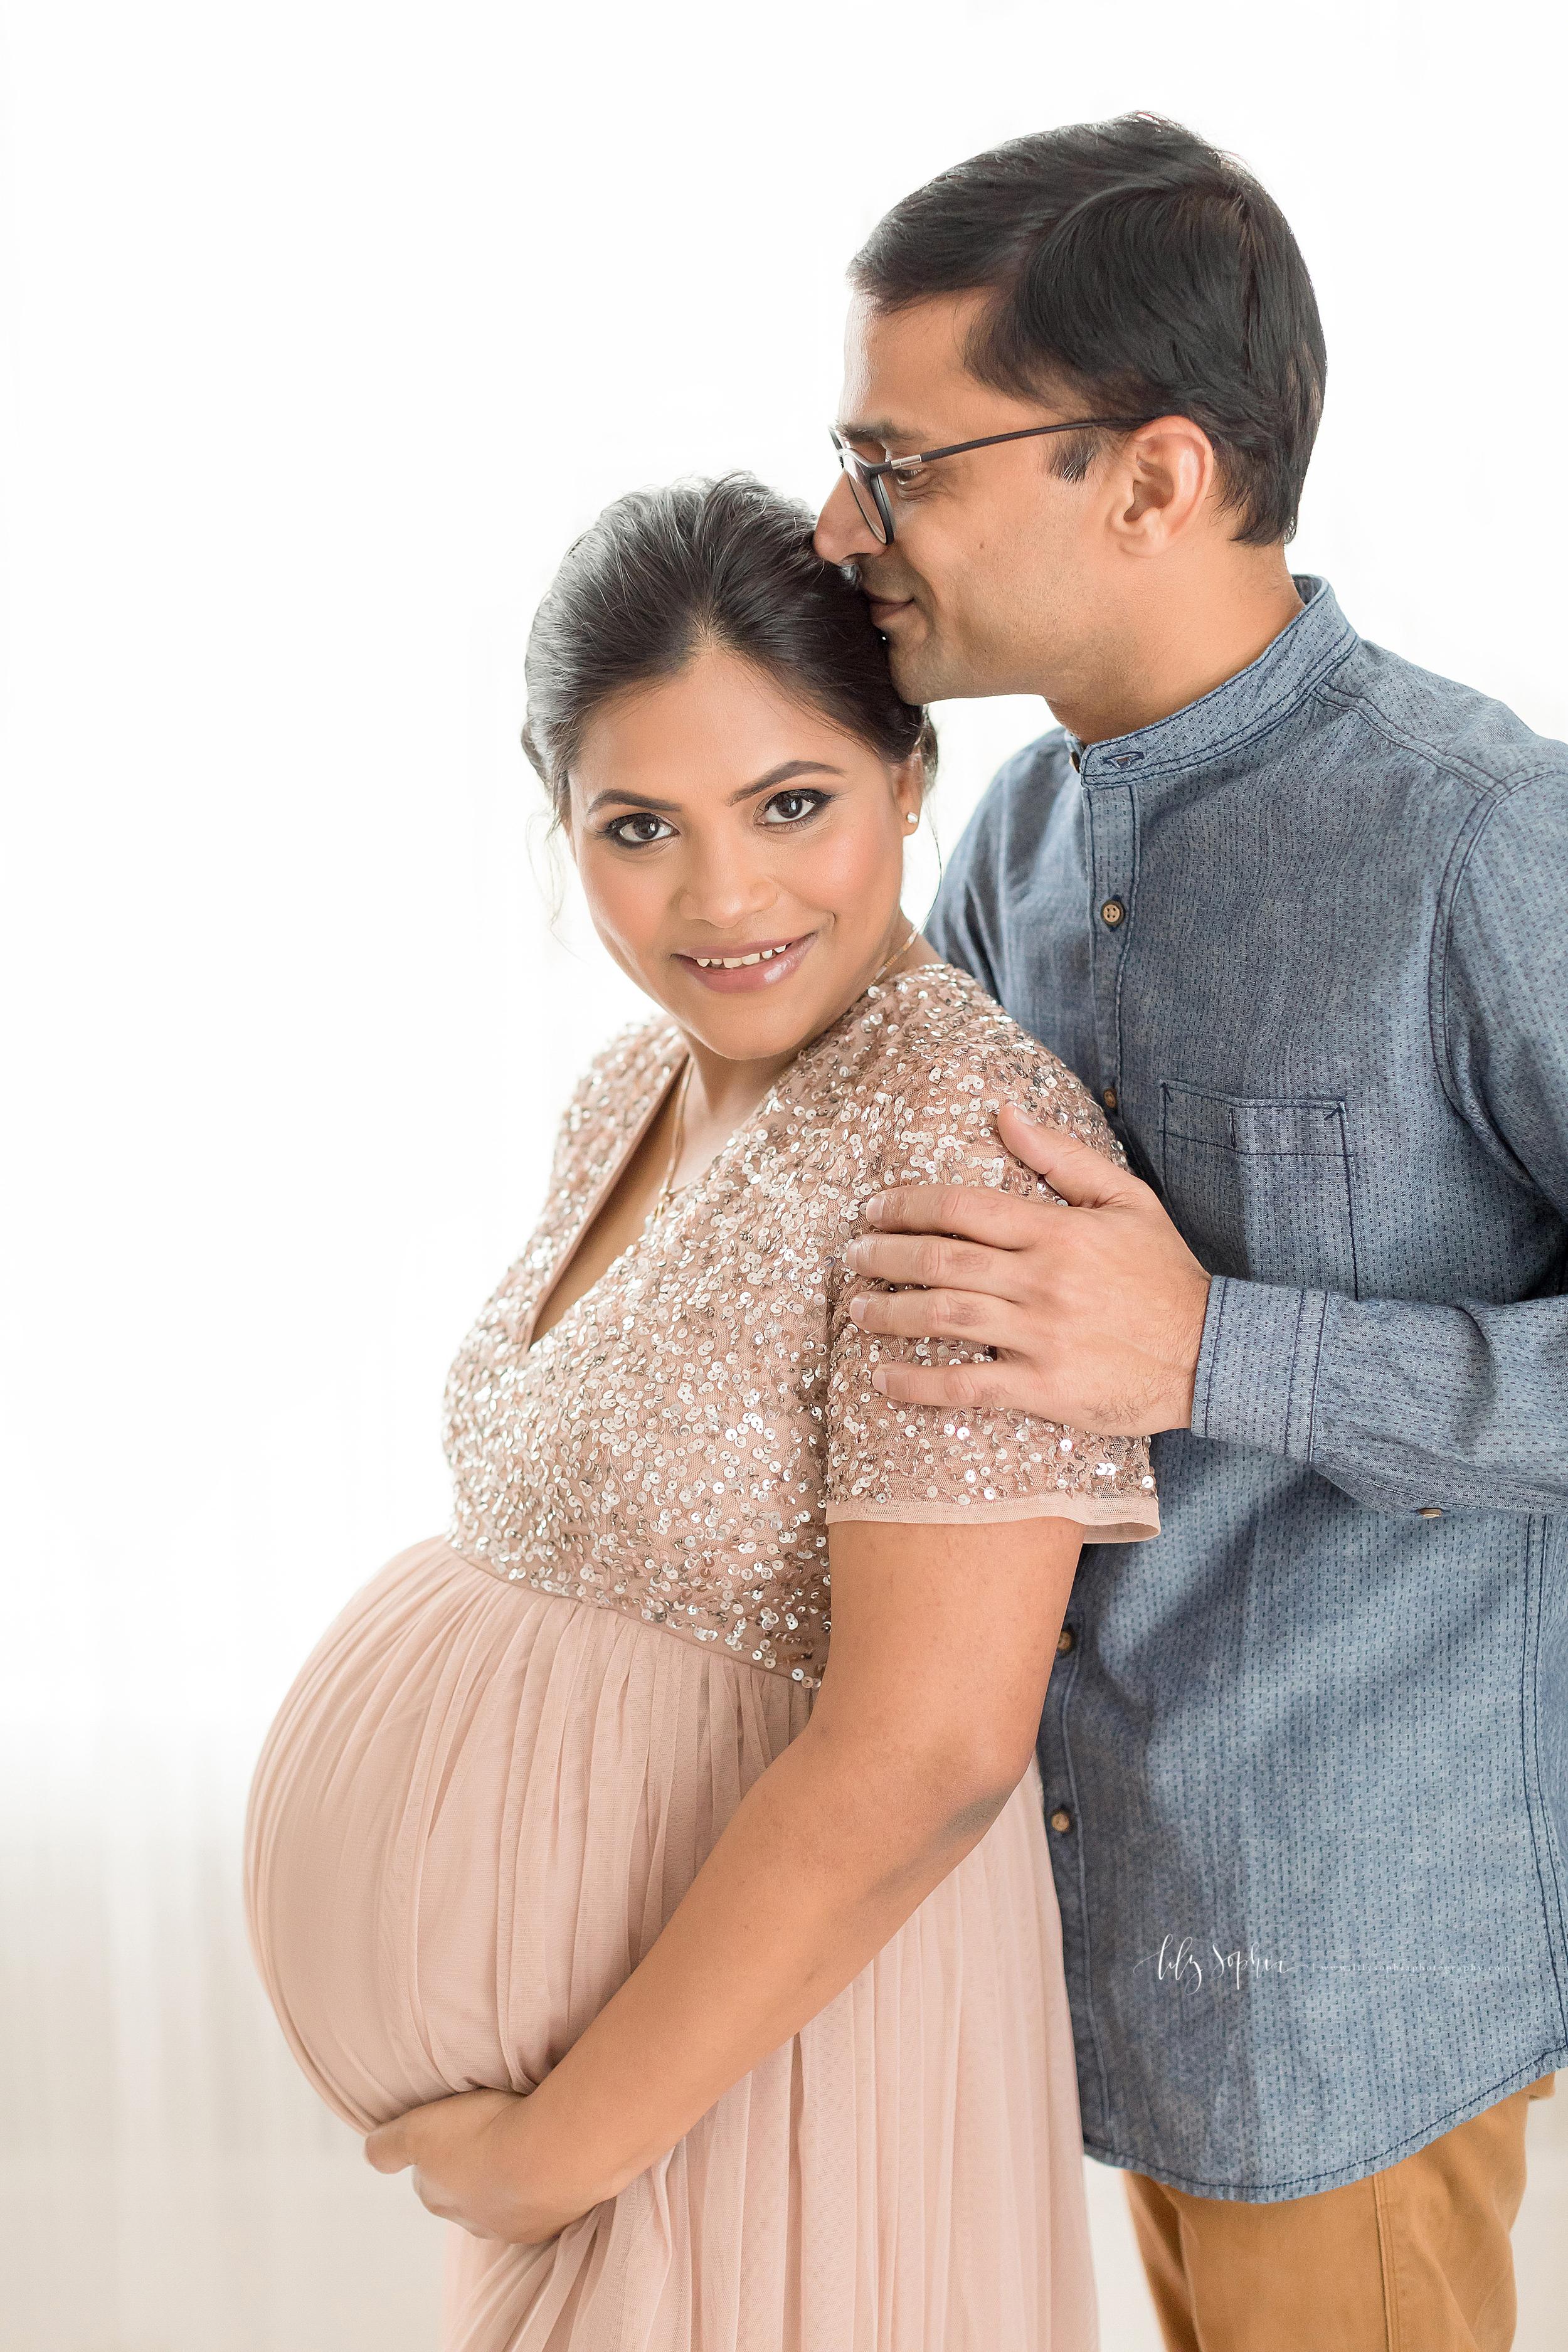 atlanta-decatur-candler-park-sandy-springs-buckhead-virginia-highlands-west-end-decatur-lily-sophia-photography-indian-couples-maternity-photos-expecting-baby-boy_2064.jpg